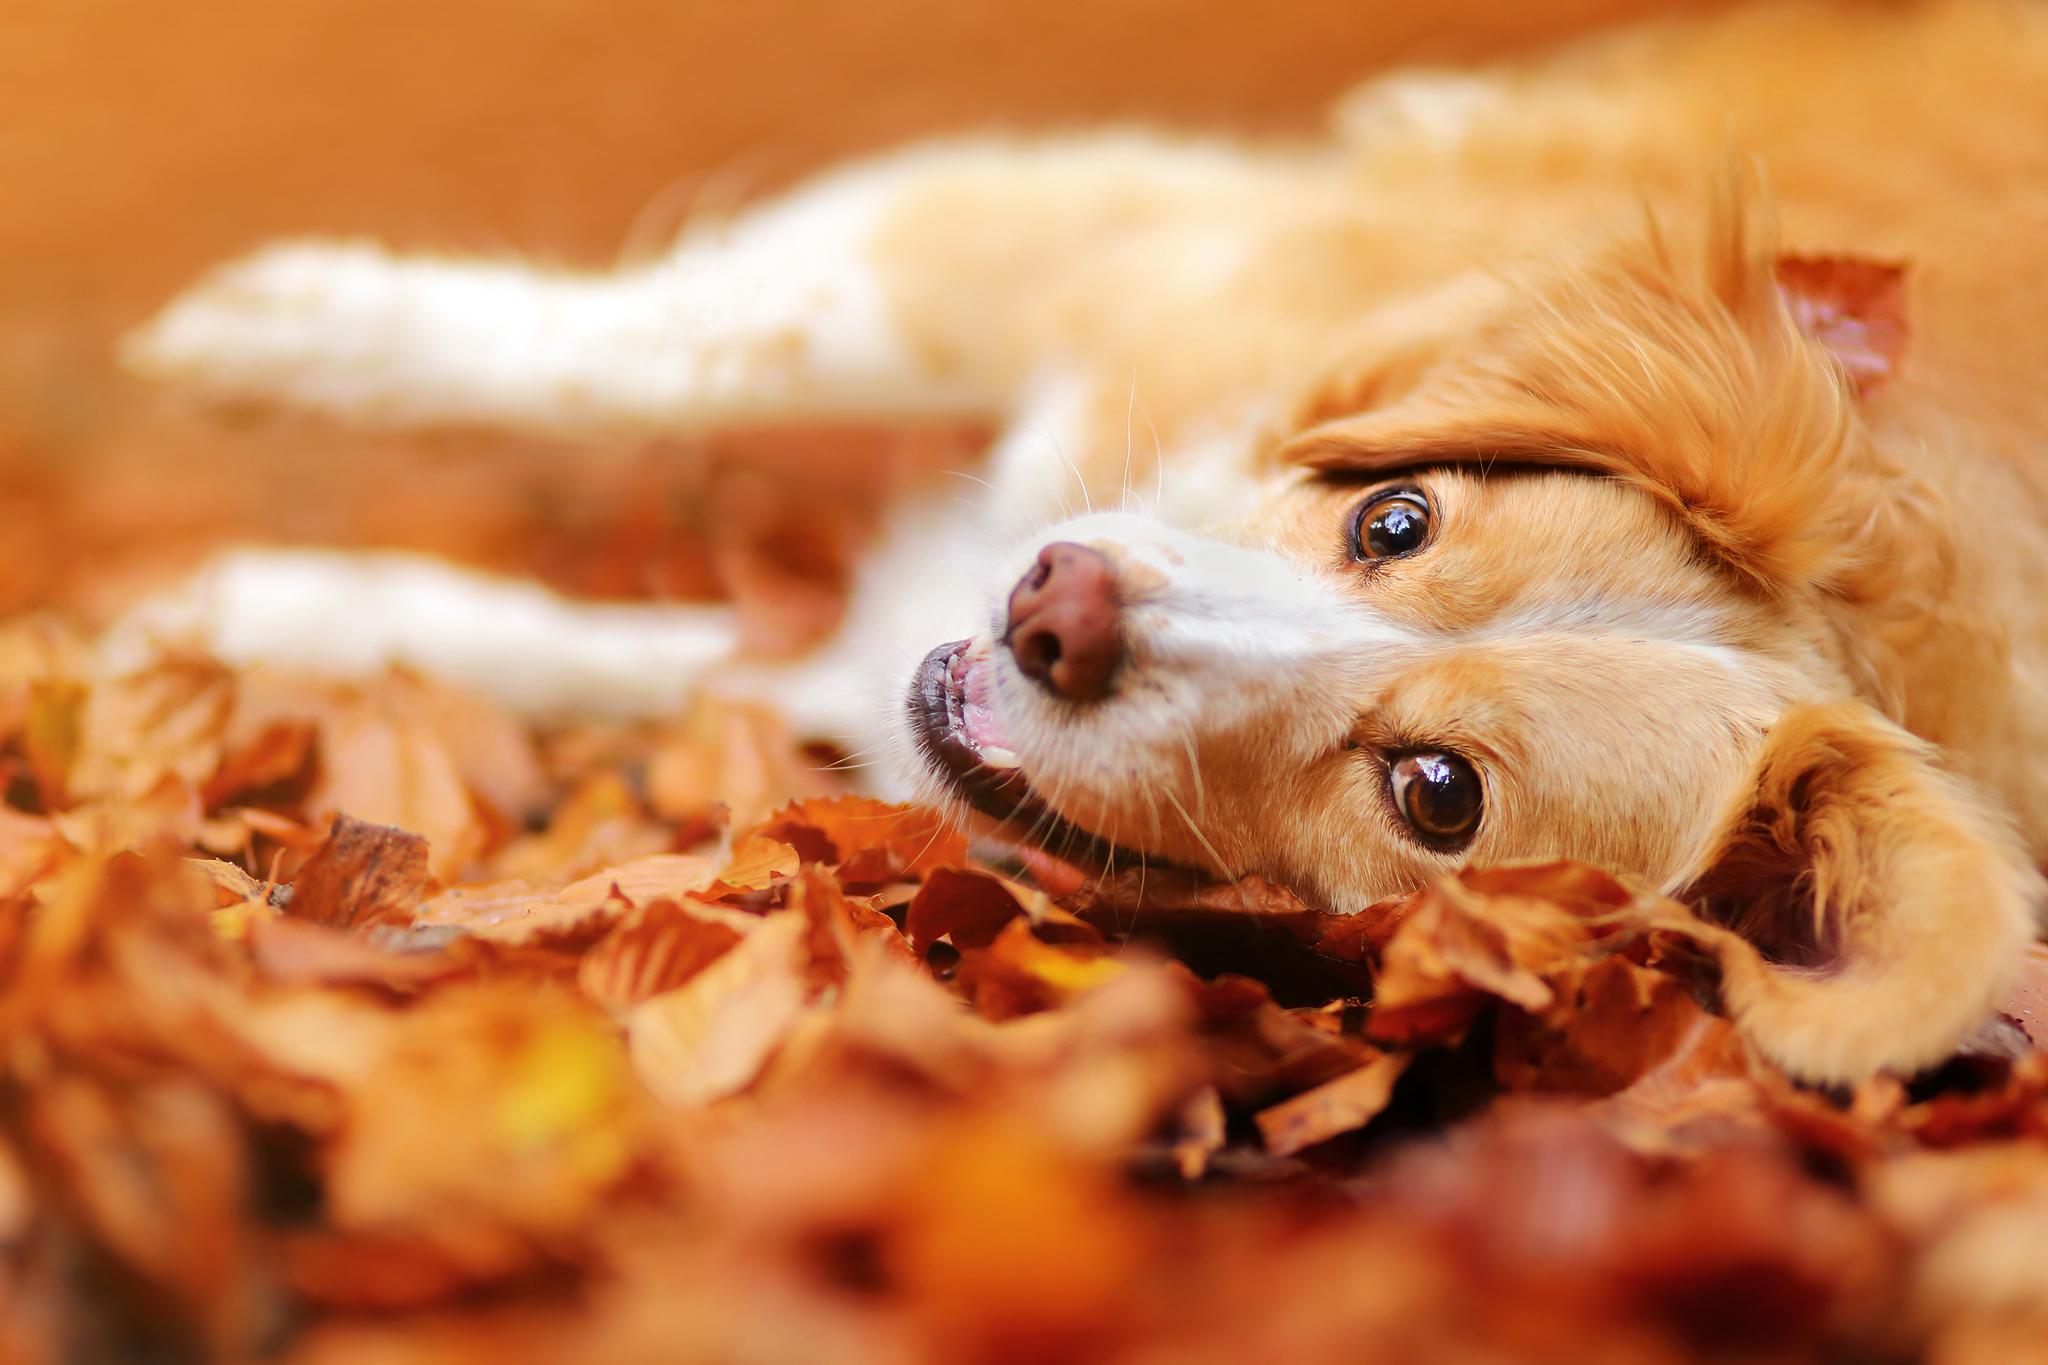 картинка осенняя улыбка собаки анкете психолога